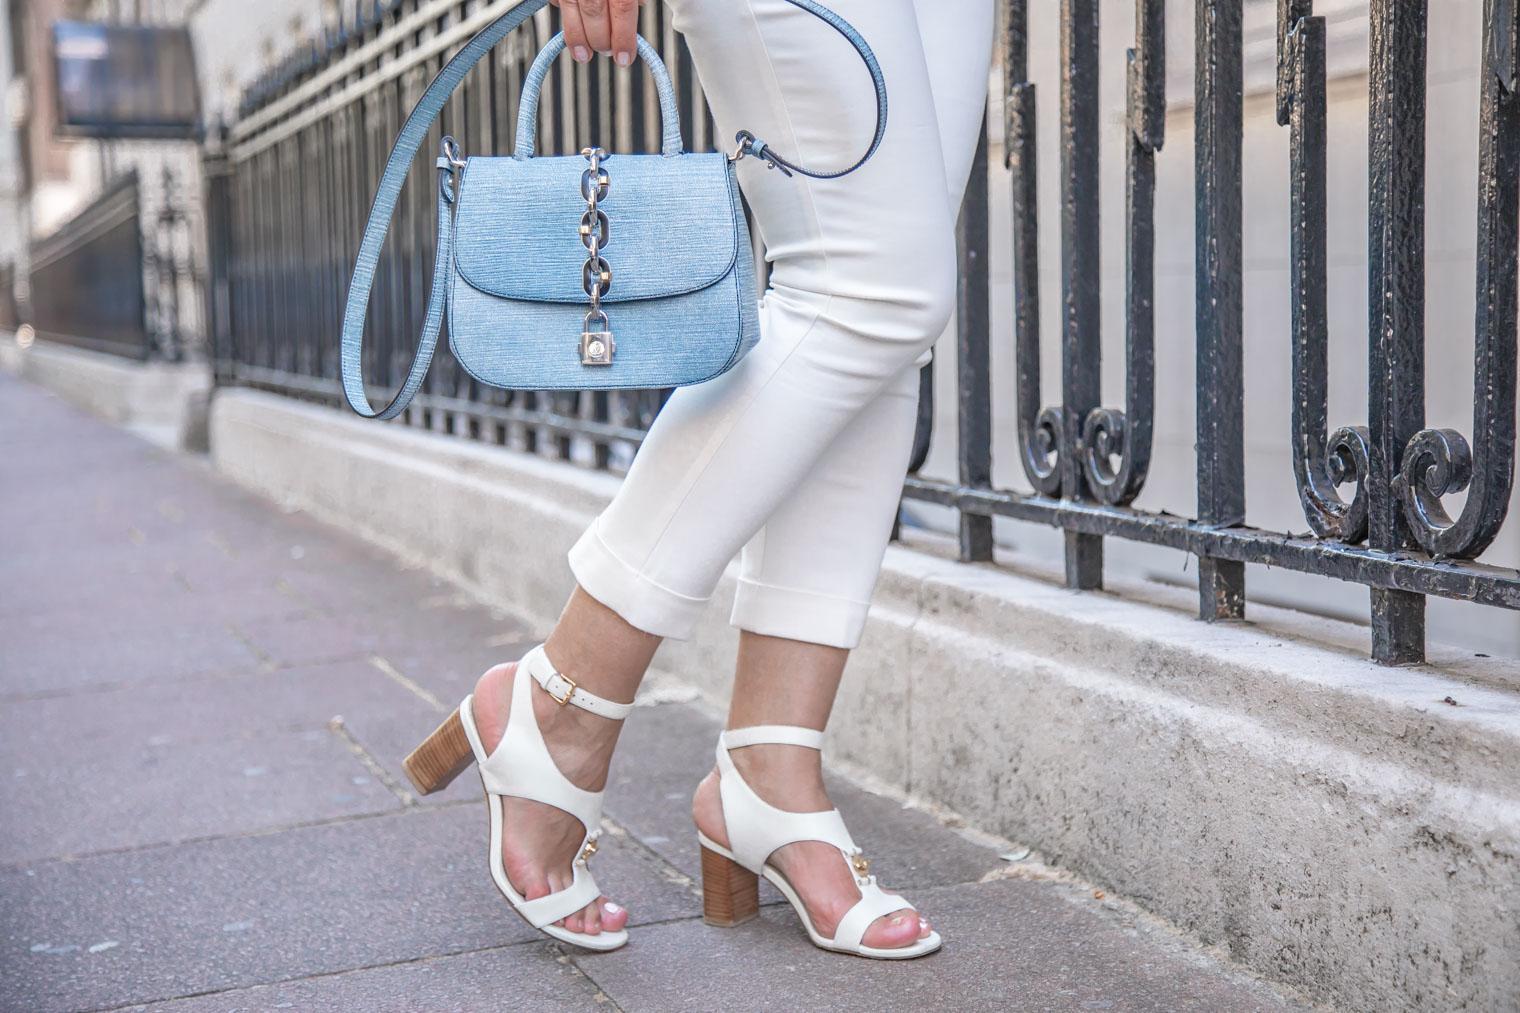 Loro Piana shoes, Prada trousers and Louis Vuitton bag